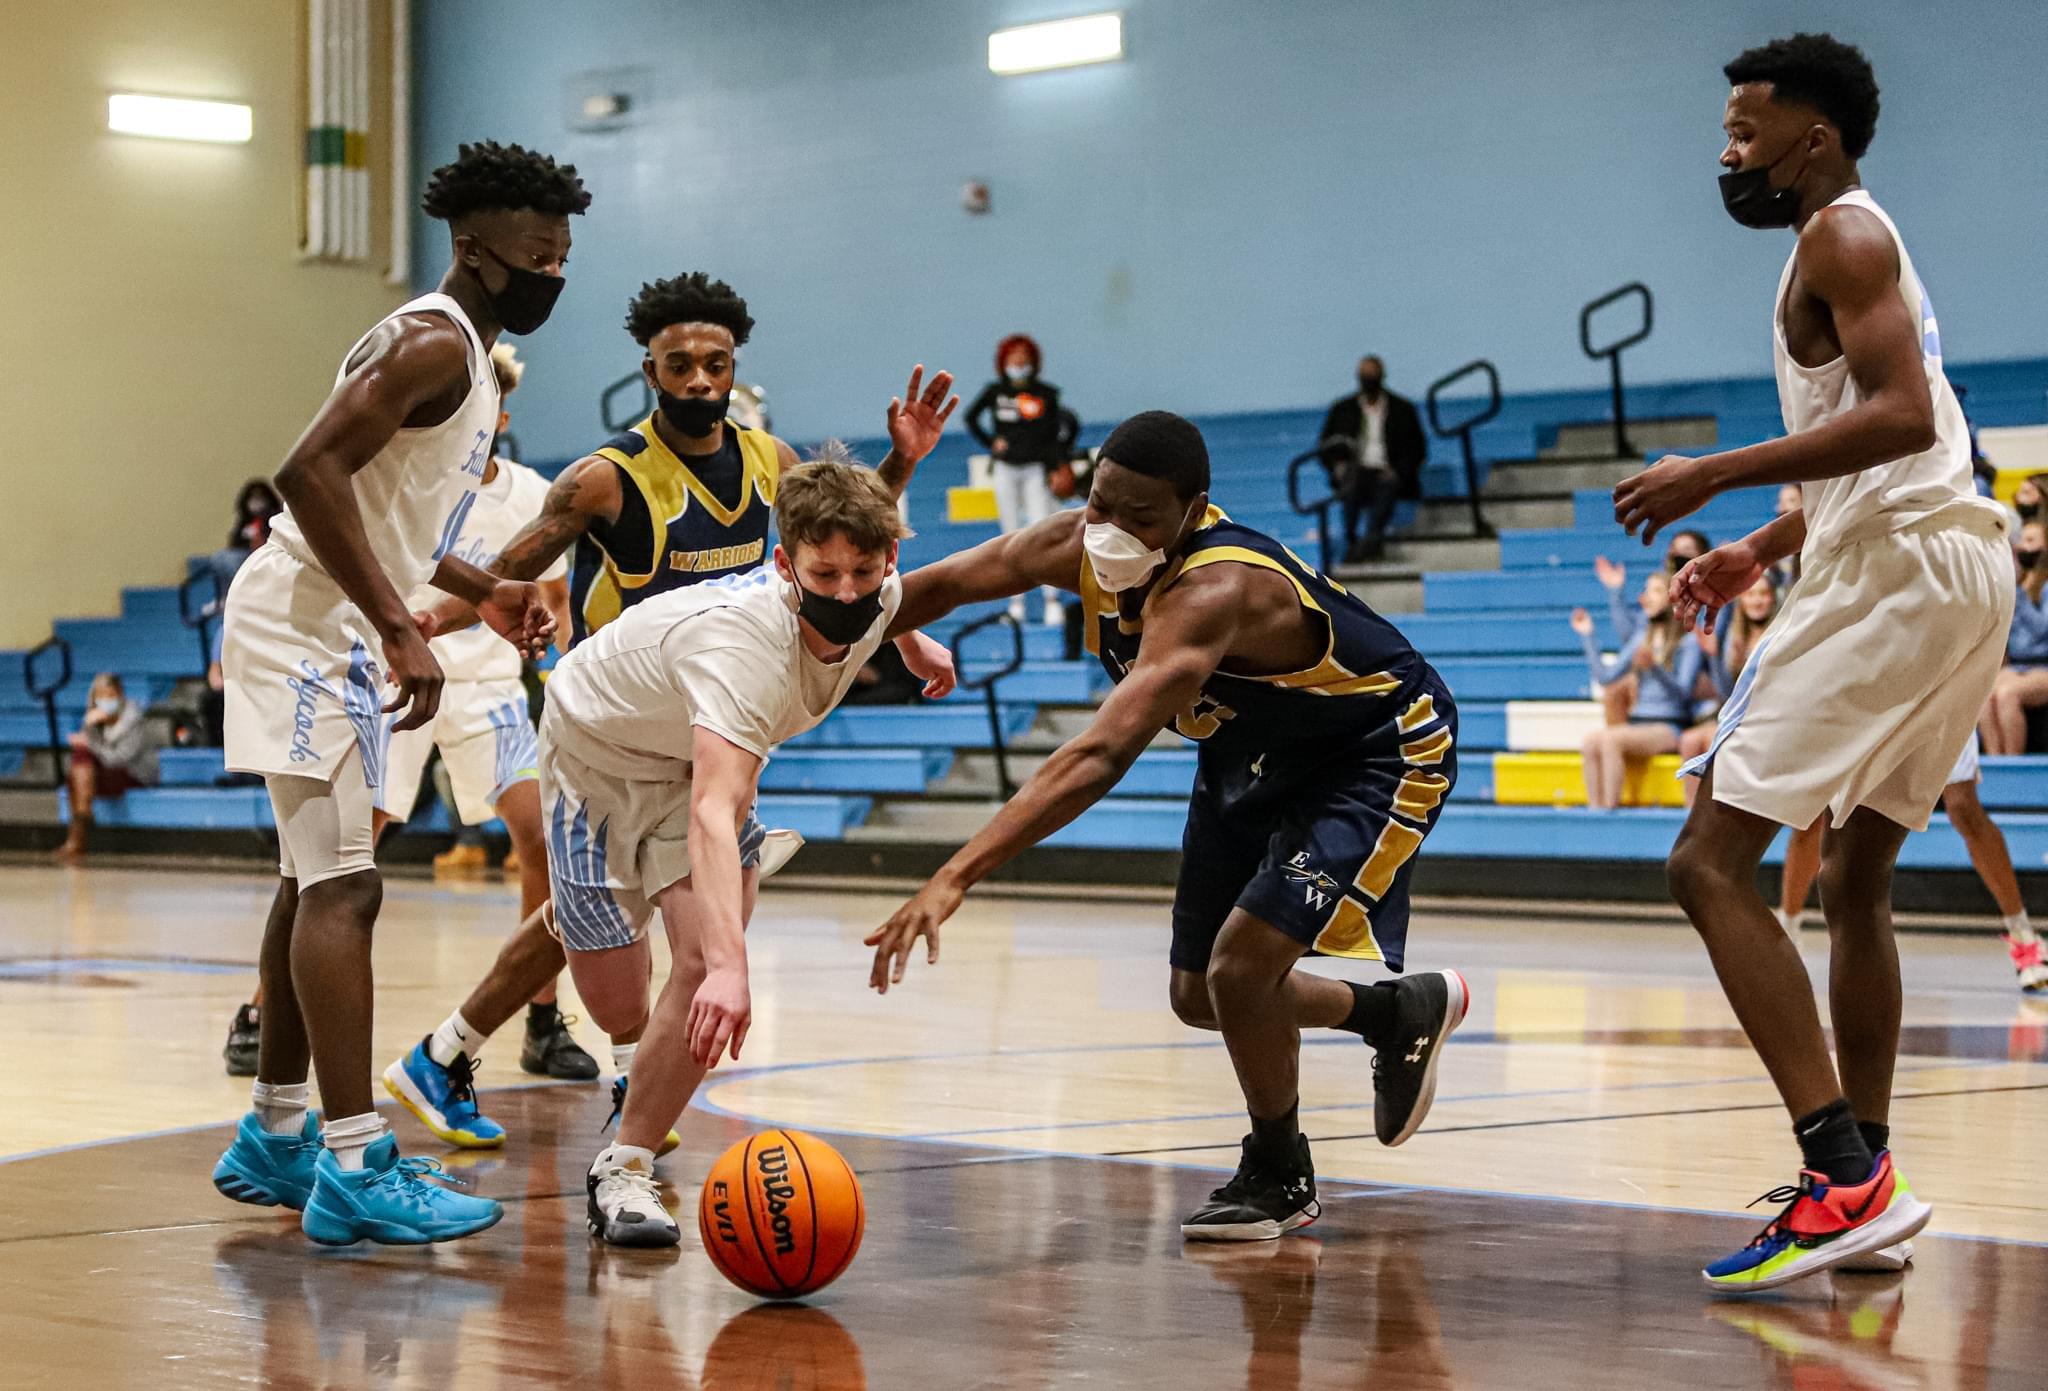 Boys Basketball: Eastern Wayne Spoils C.B. Aycock's Senior Night (PHOTO GALLERY)